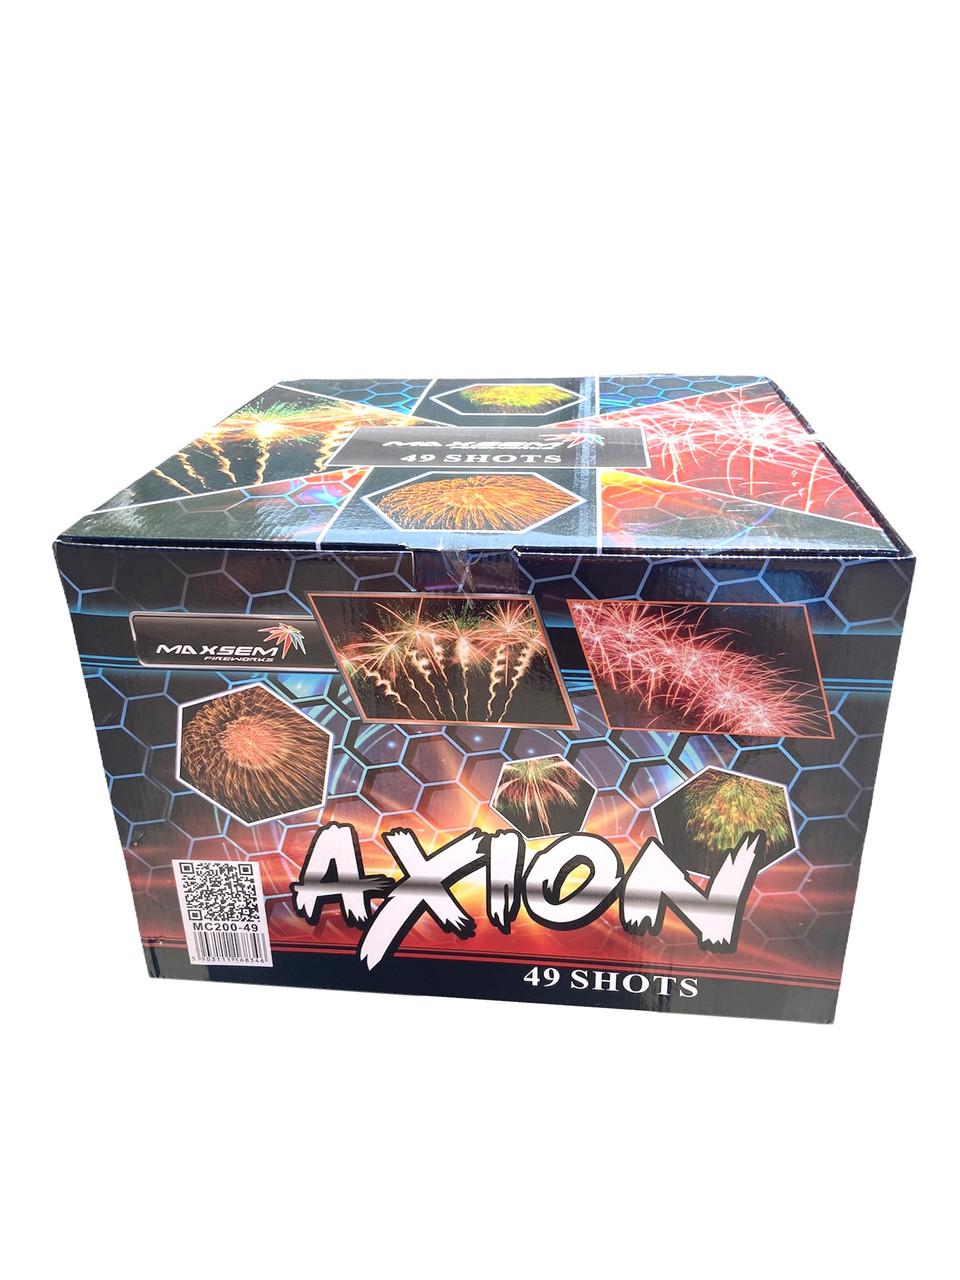 Салют Axion Maxsem MC200-49, 49 выстрелов 50 мм